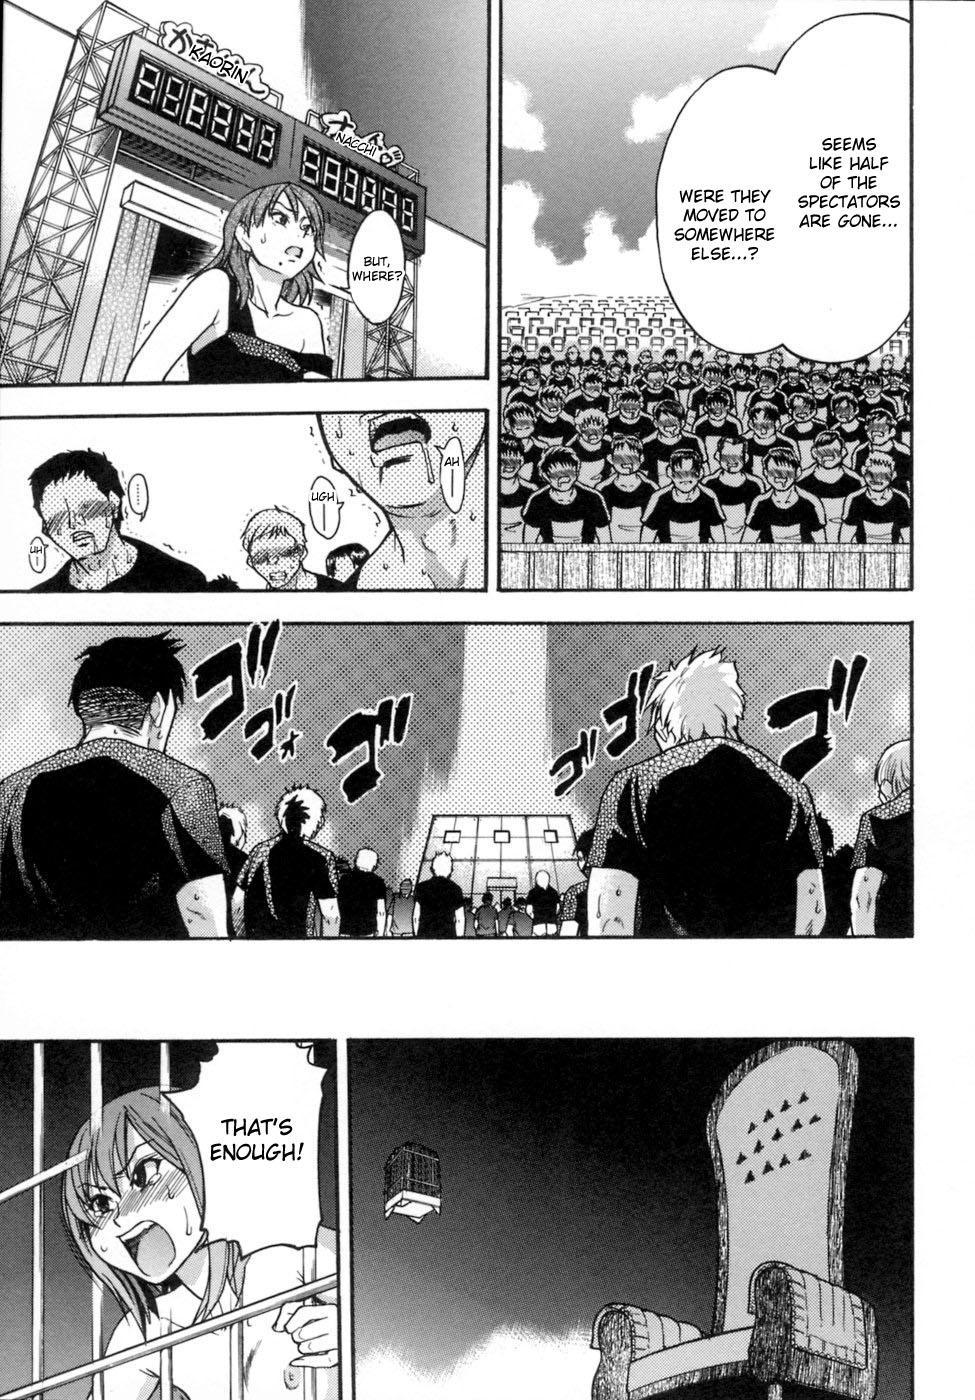 Shining Musume. 5. Five Sense of Love 159